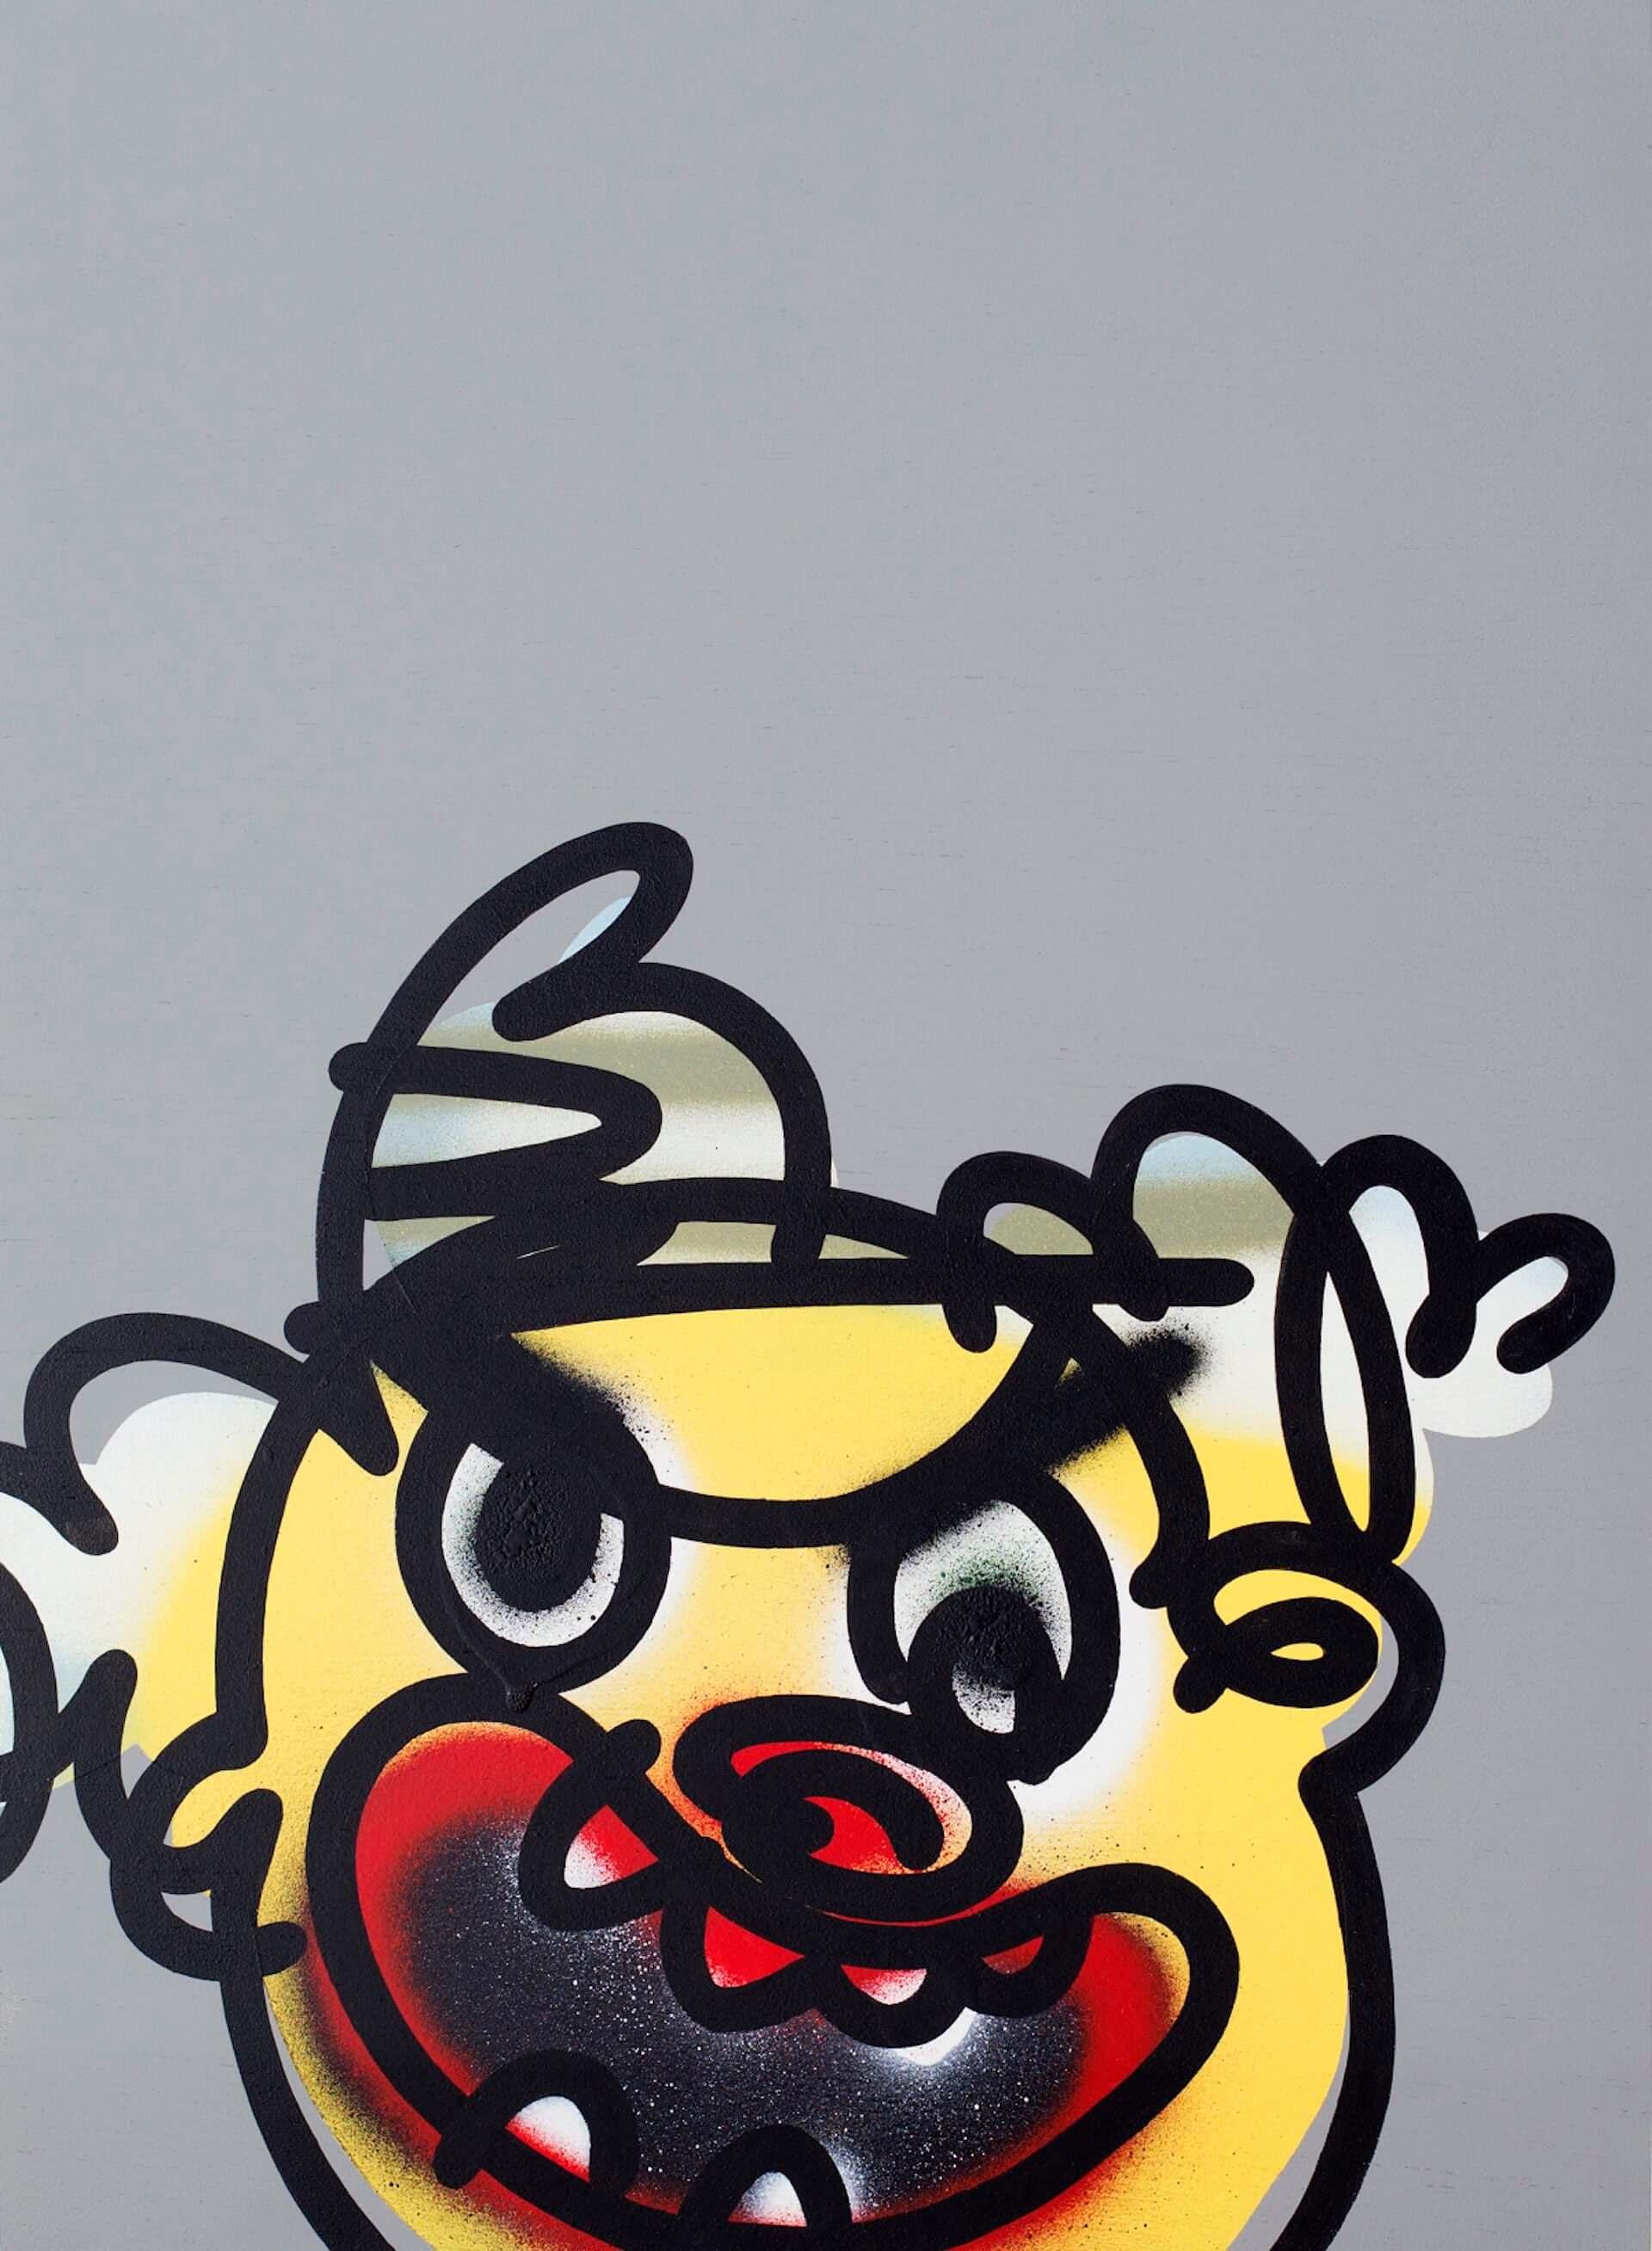 Netflix『攻殻機動隊 SAC_2045』の企画展が表参道にて開催決定!矢野恵司、Bustaskillらによる描き下ろしの新作など展示 art201215_gits-exhibition_1-1920x2616